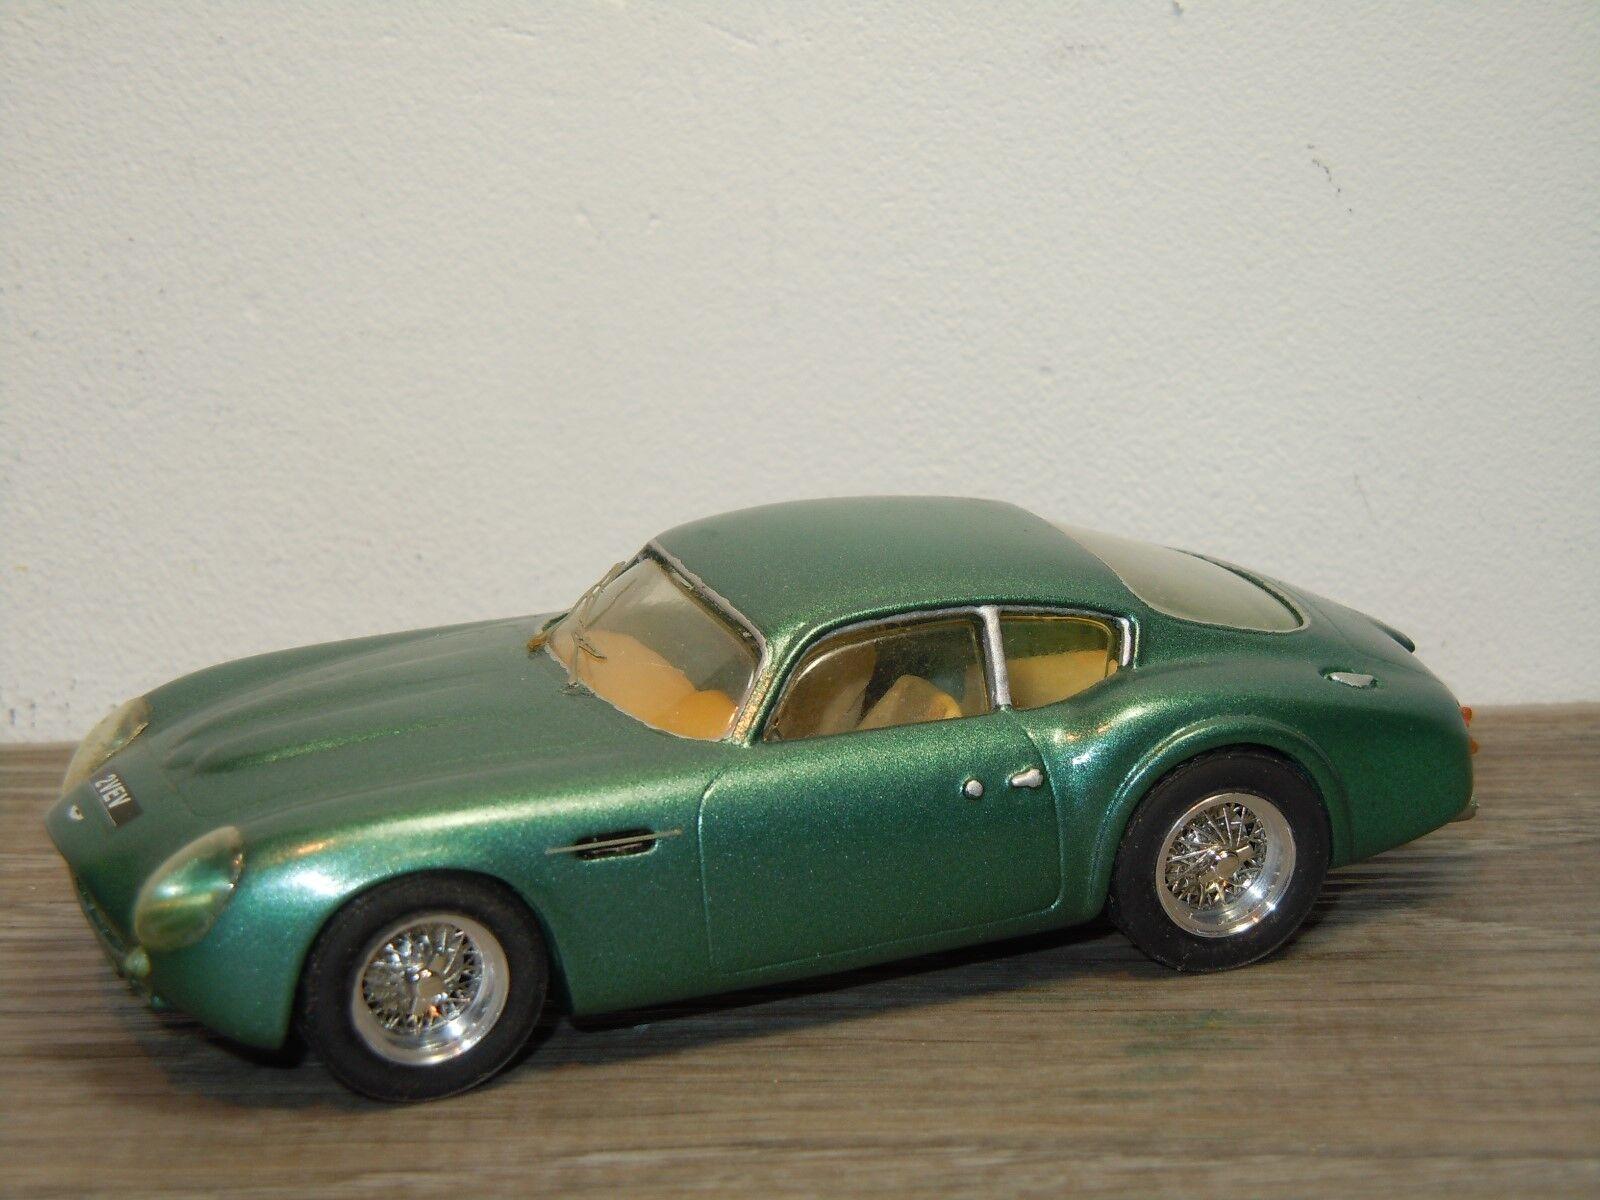 Aston Martin DB4 GT Zagato - Provence Moulage France 1 43 34967